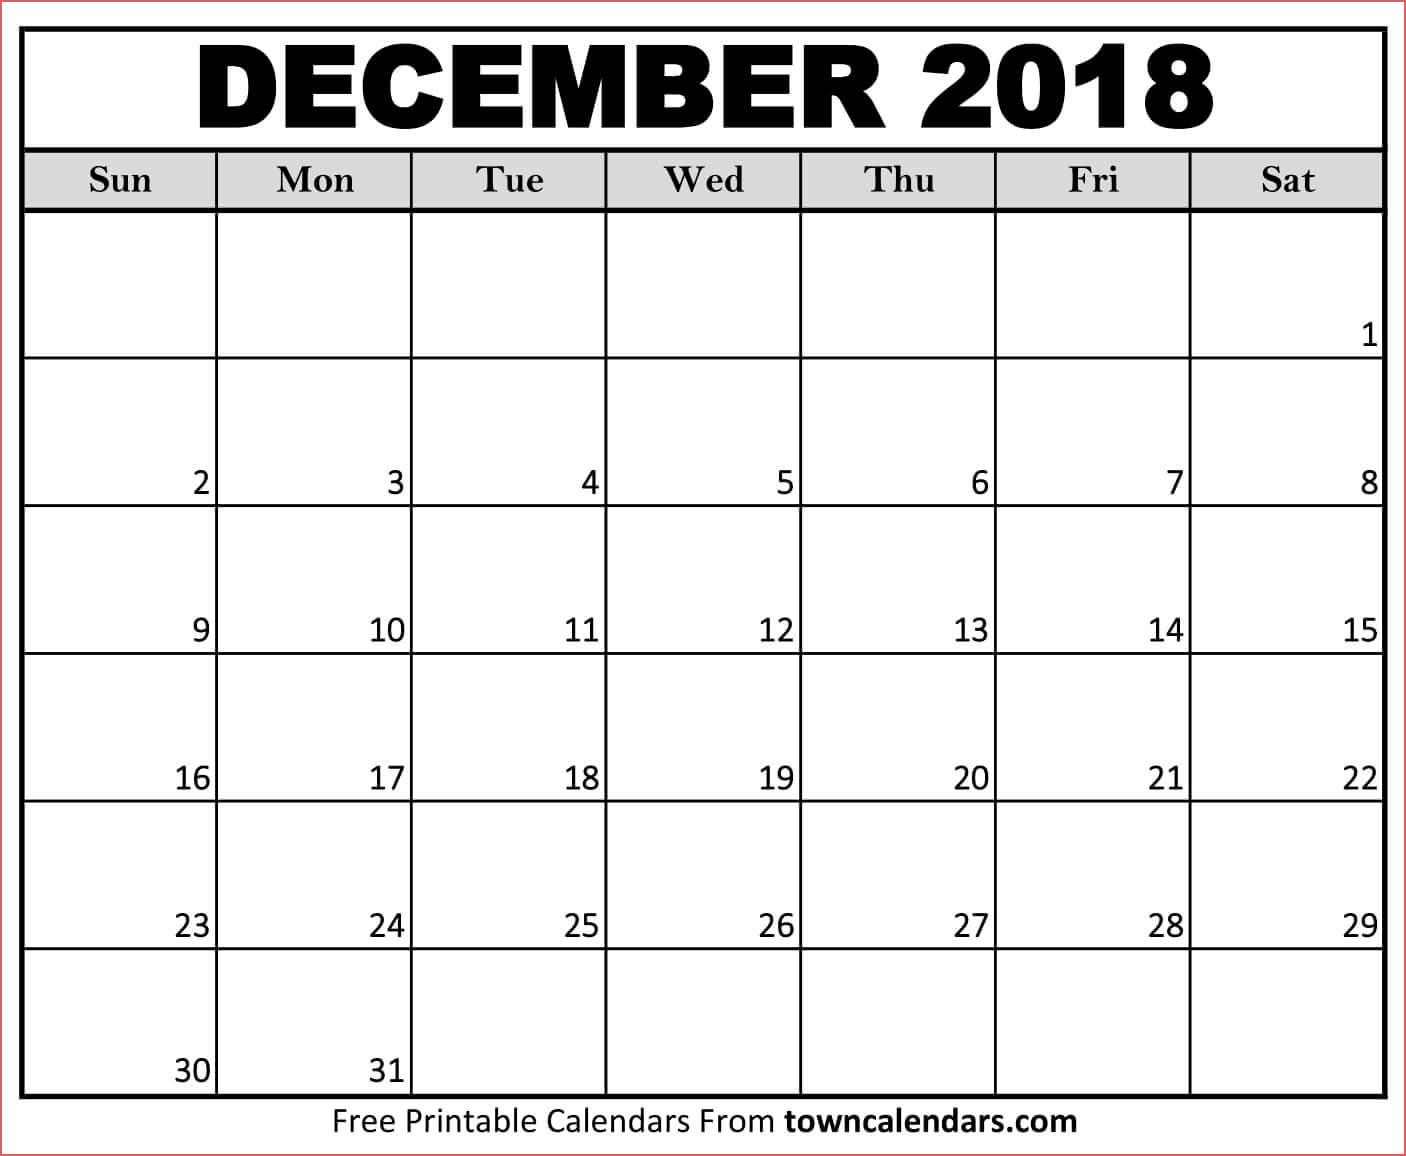 December Calendar Printable December 2018 Calendar Canada Printable inside Dec Calendar Printable Template